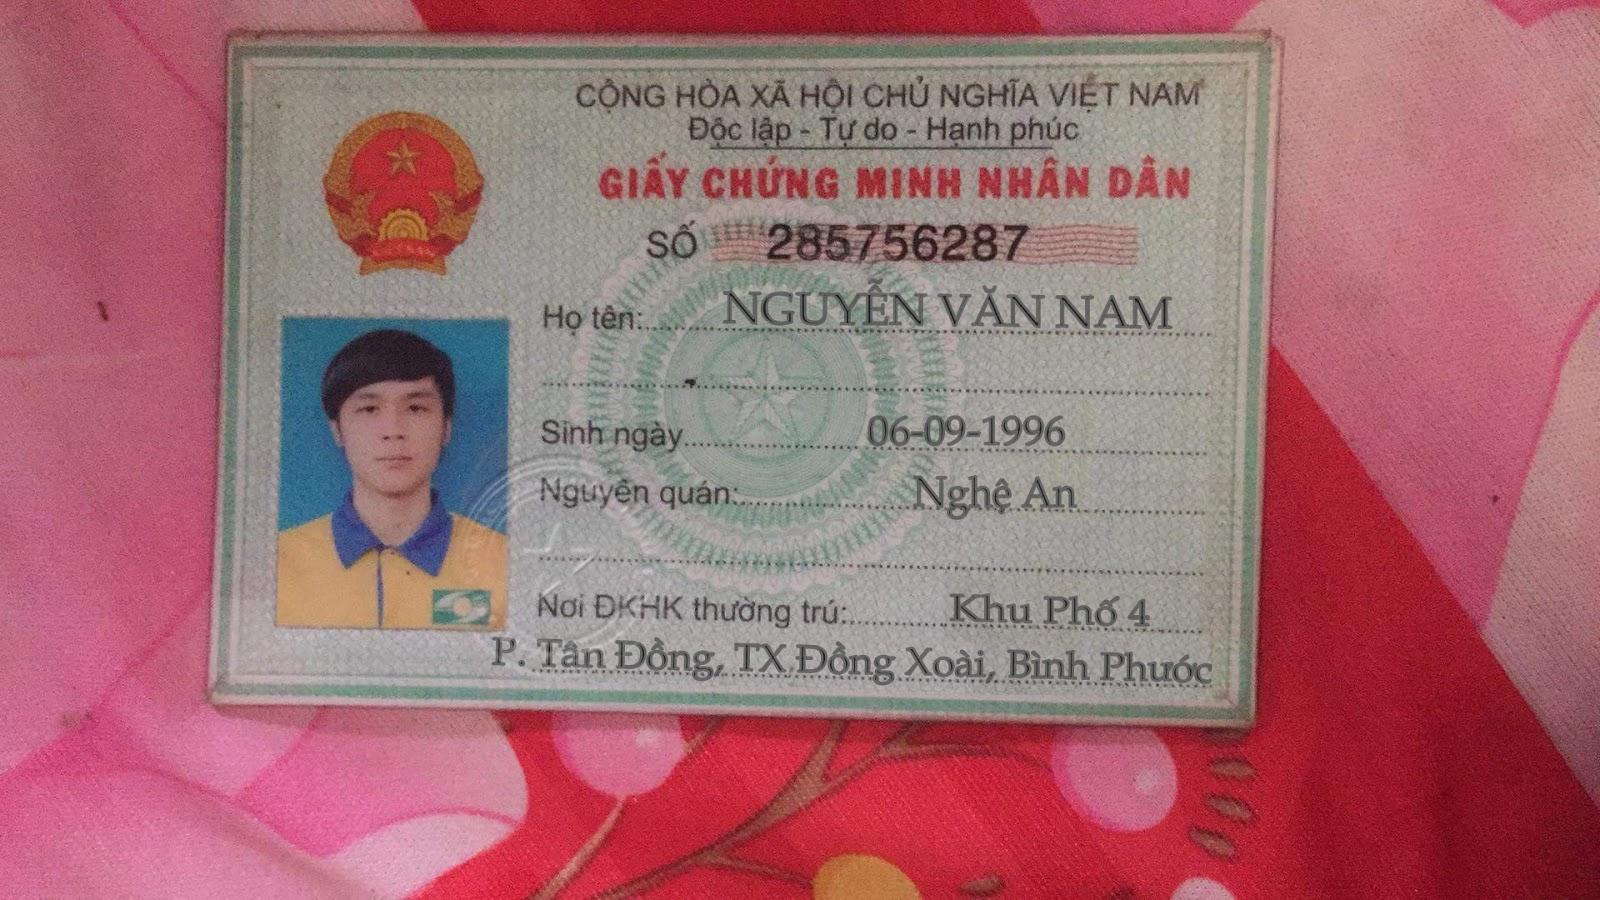 Share PSD CMND Nam Chuẩn Chưa Fix